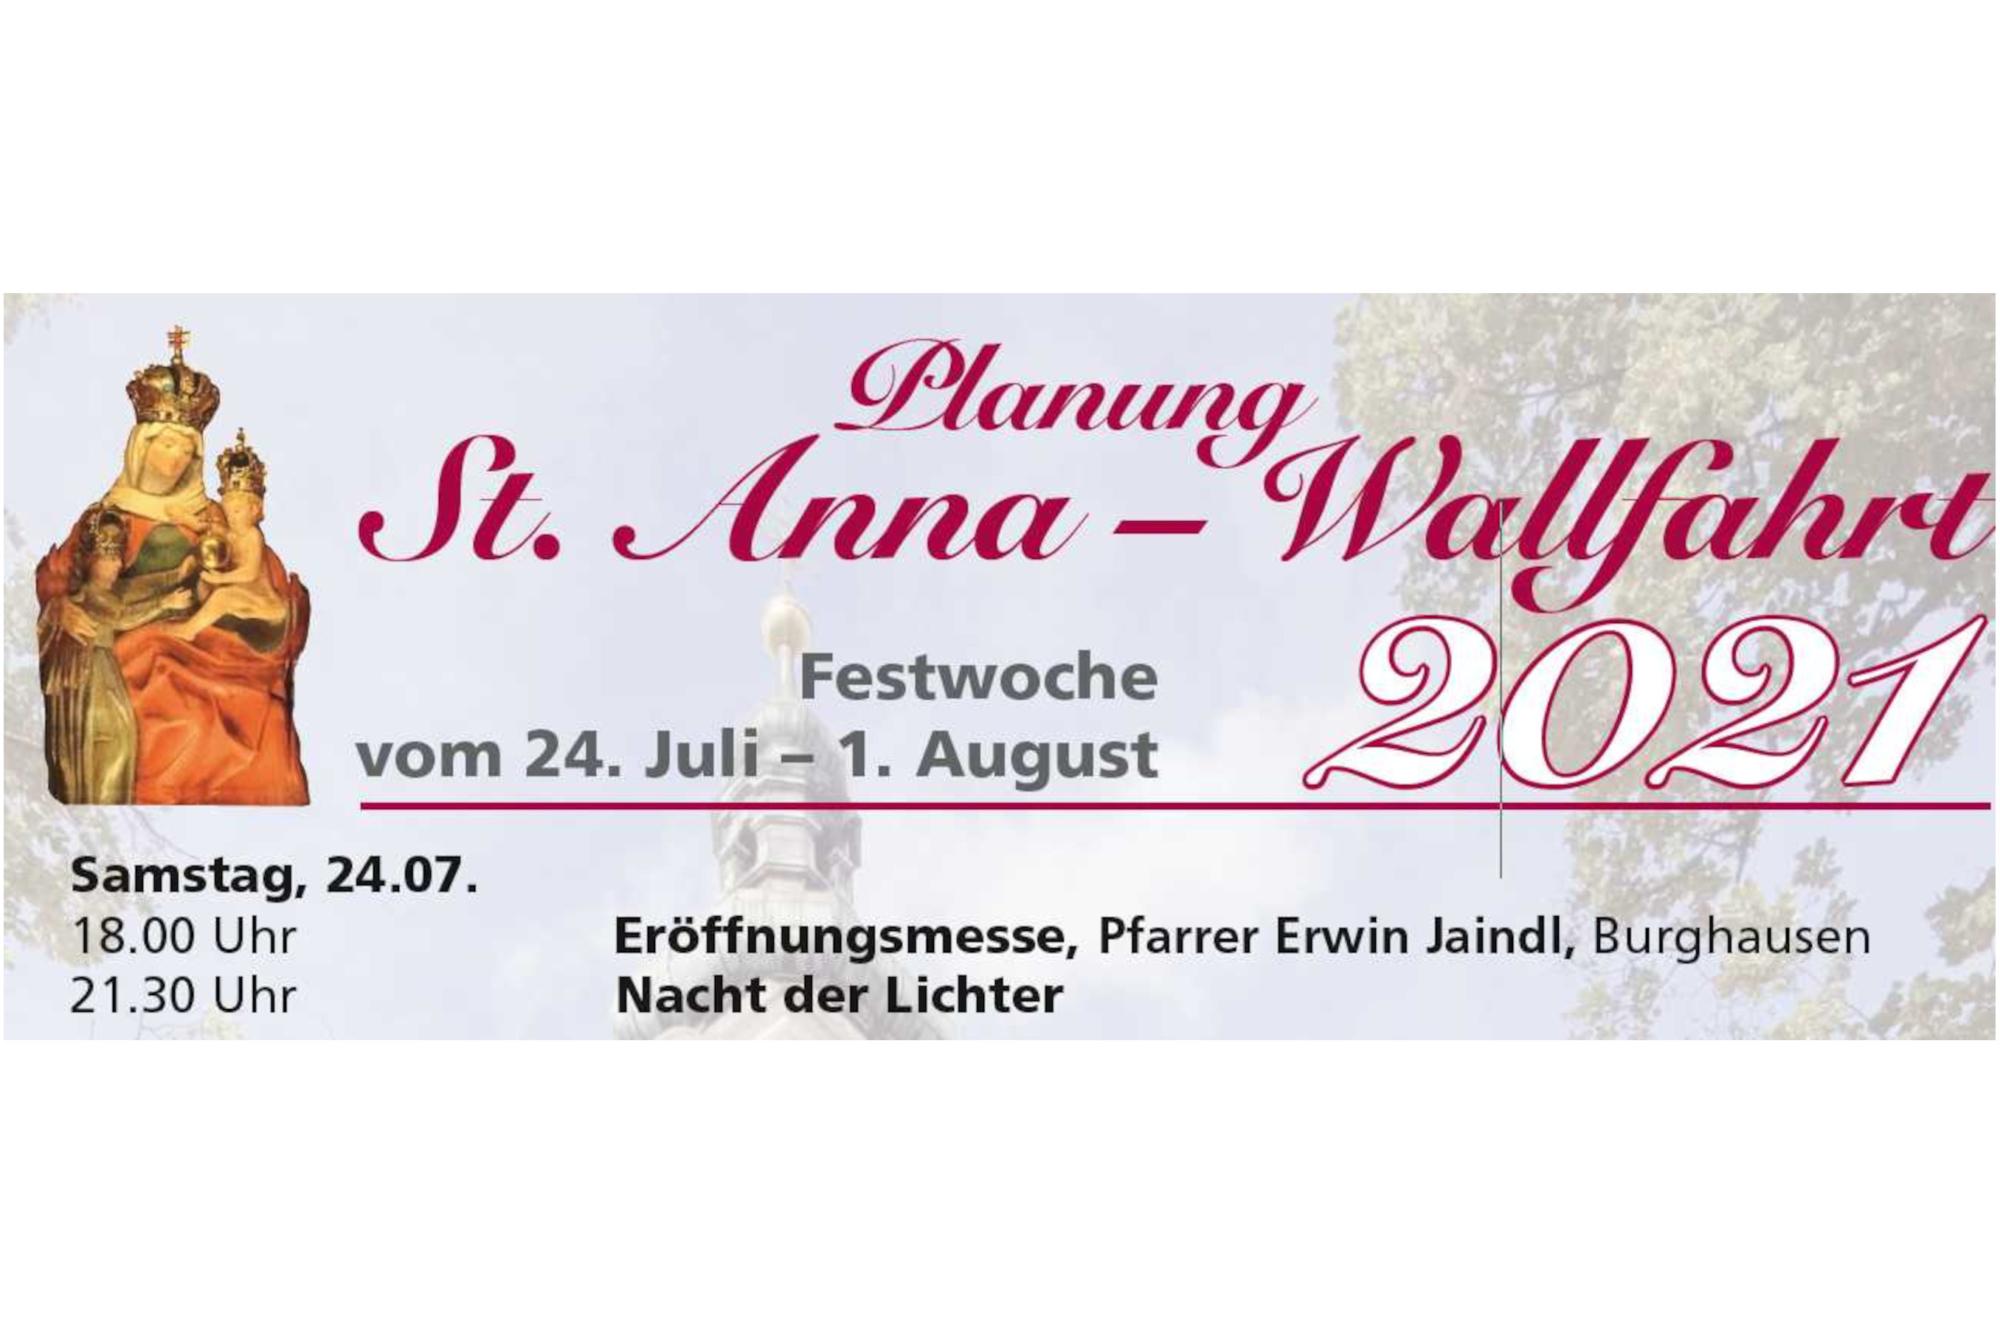 St Anna Wallfahrt 2